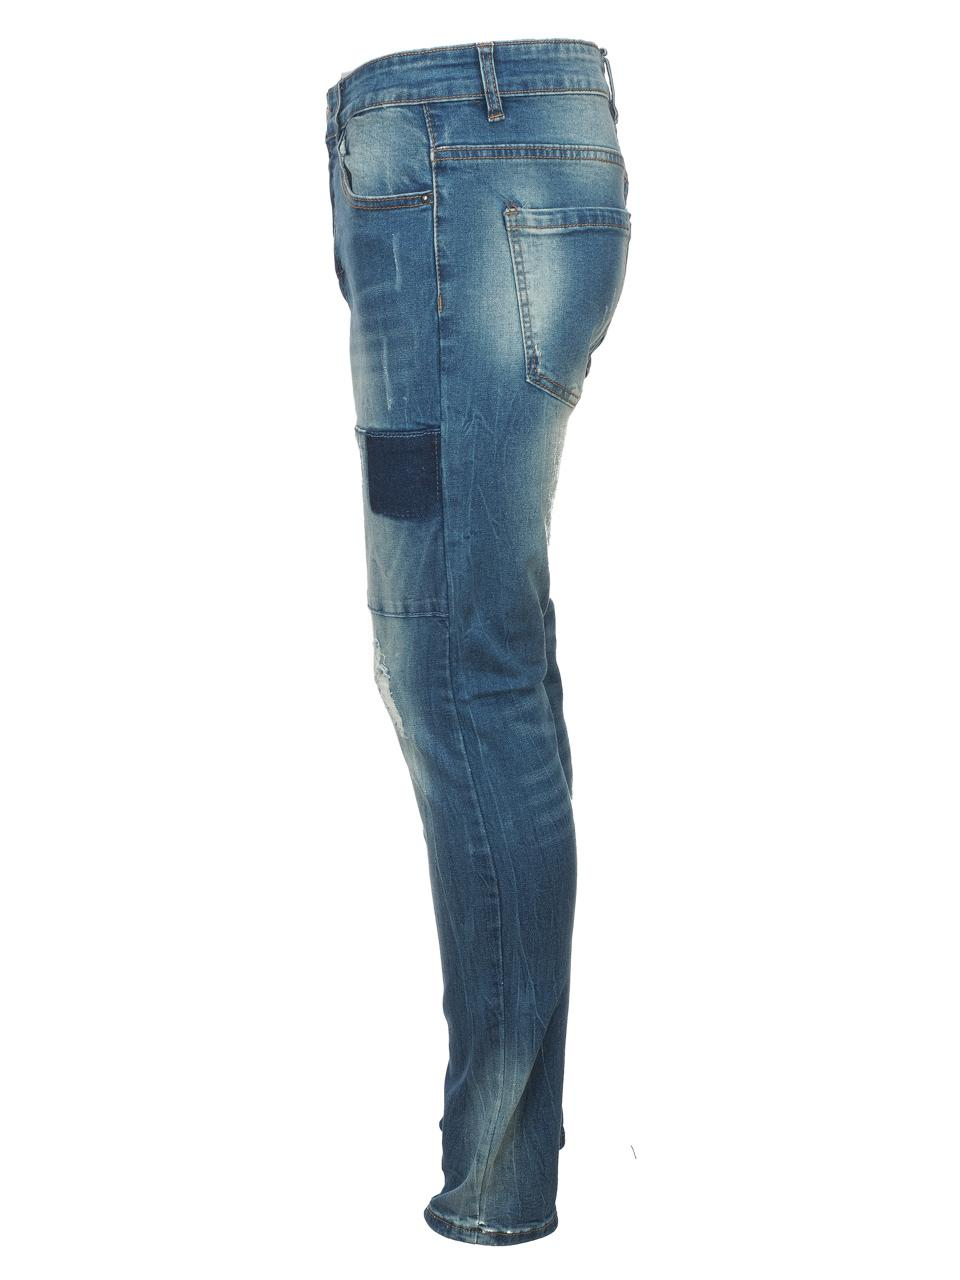 Jeans-Pants-Hite-Couture-Kimit-Blue-Blue-Jeans-56935-New thumbnail 2